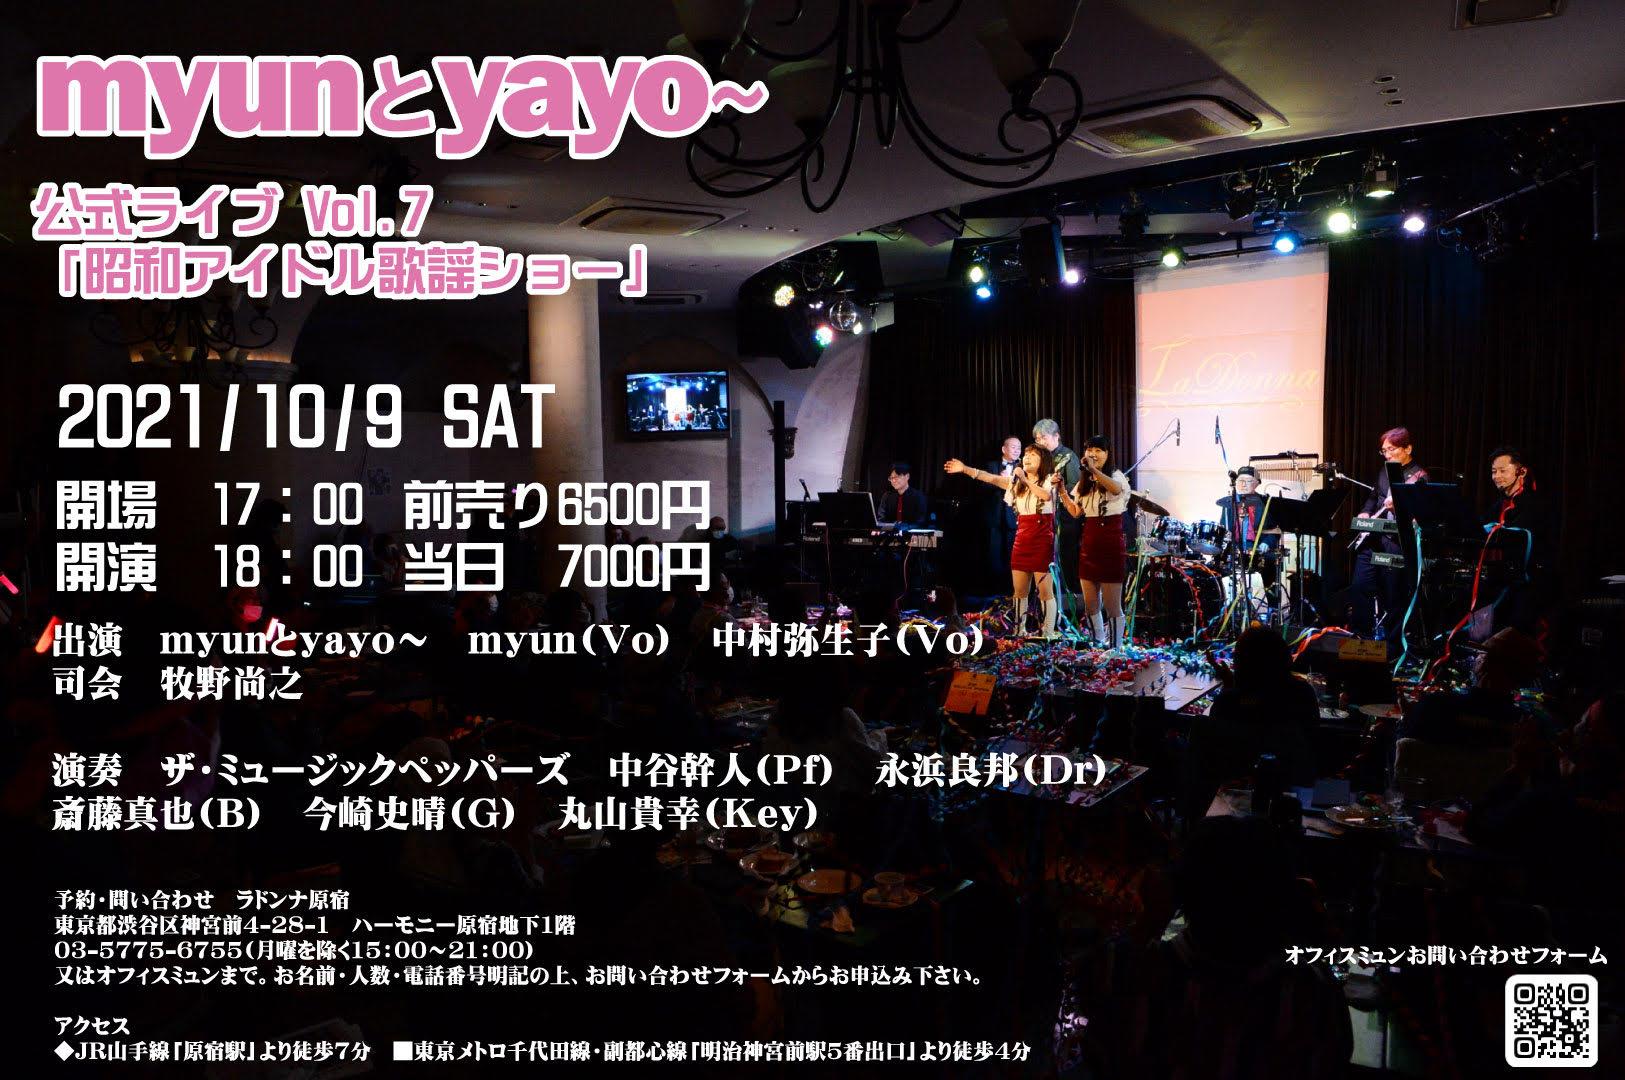 myunとyayo~ 「昭和アイドル歌謡ショー」 公式LIVE vol.7